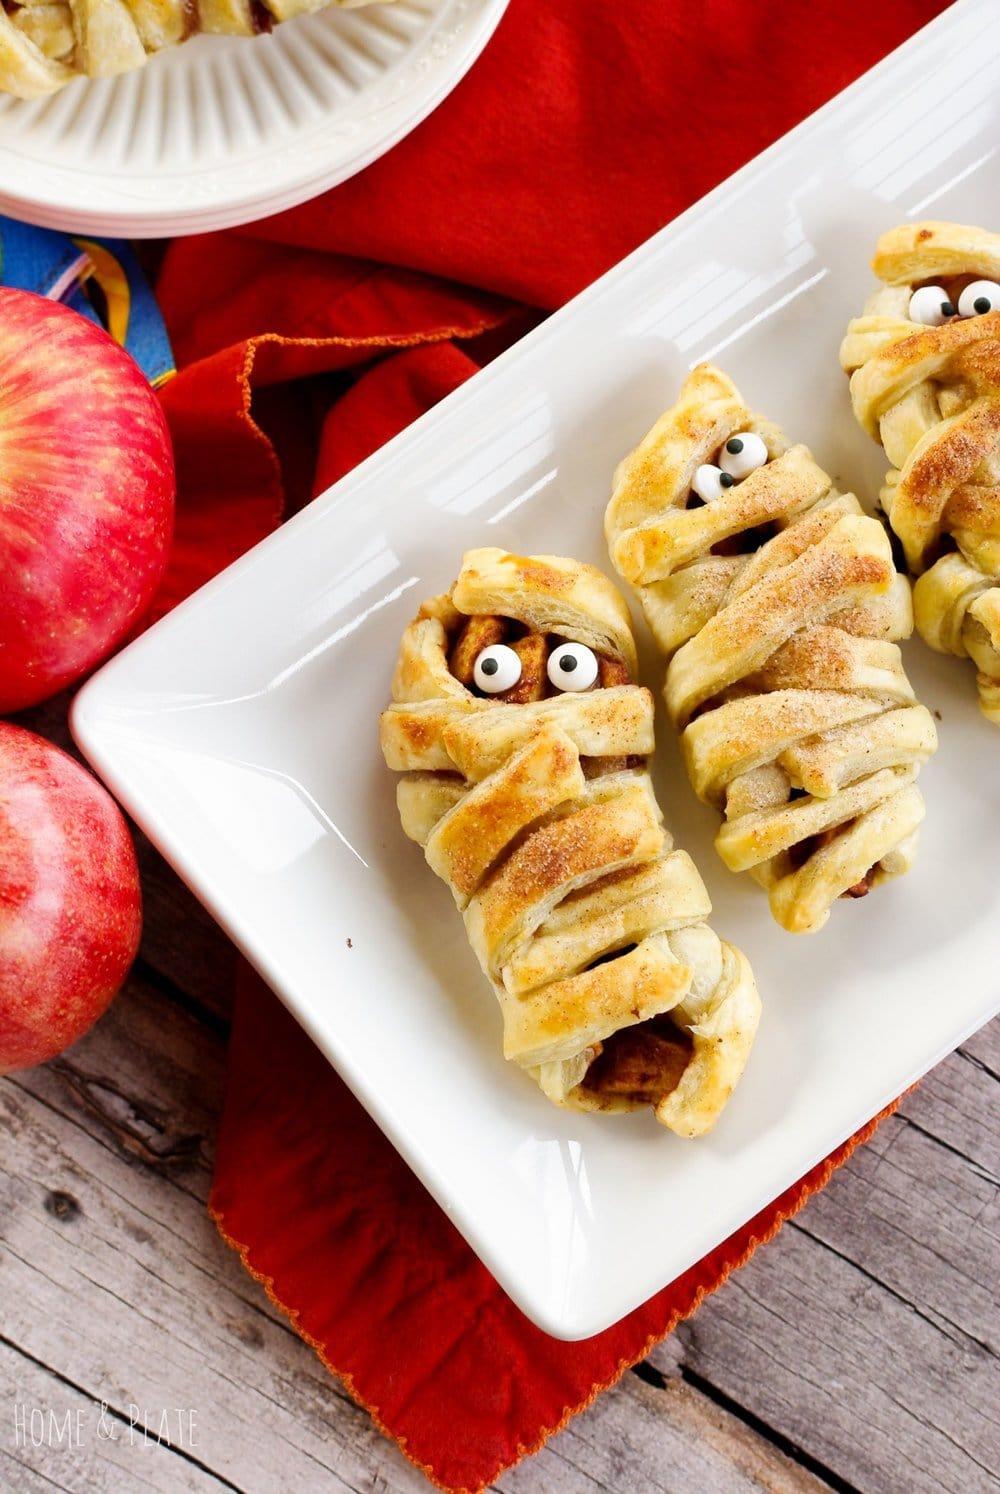 Healthy Halloween Treats – Mummy Apple Crypts